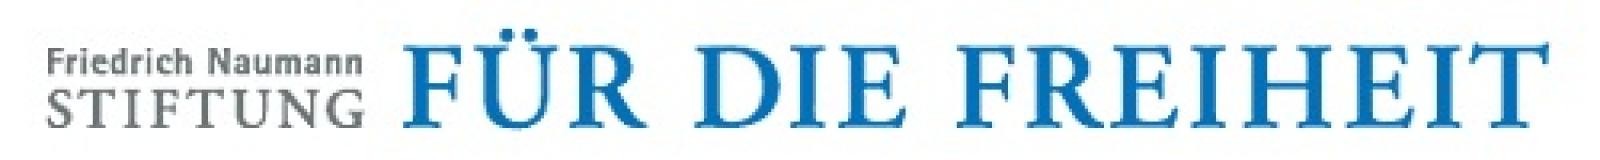 Logo_Friedrich_Naumann_Stiftung_1600x1200